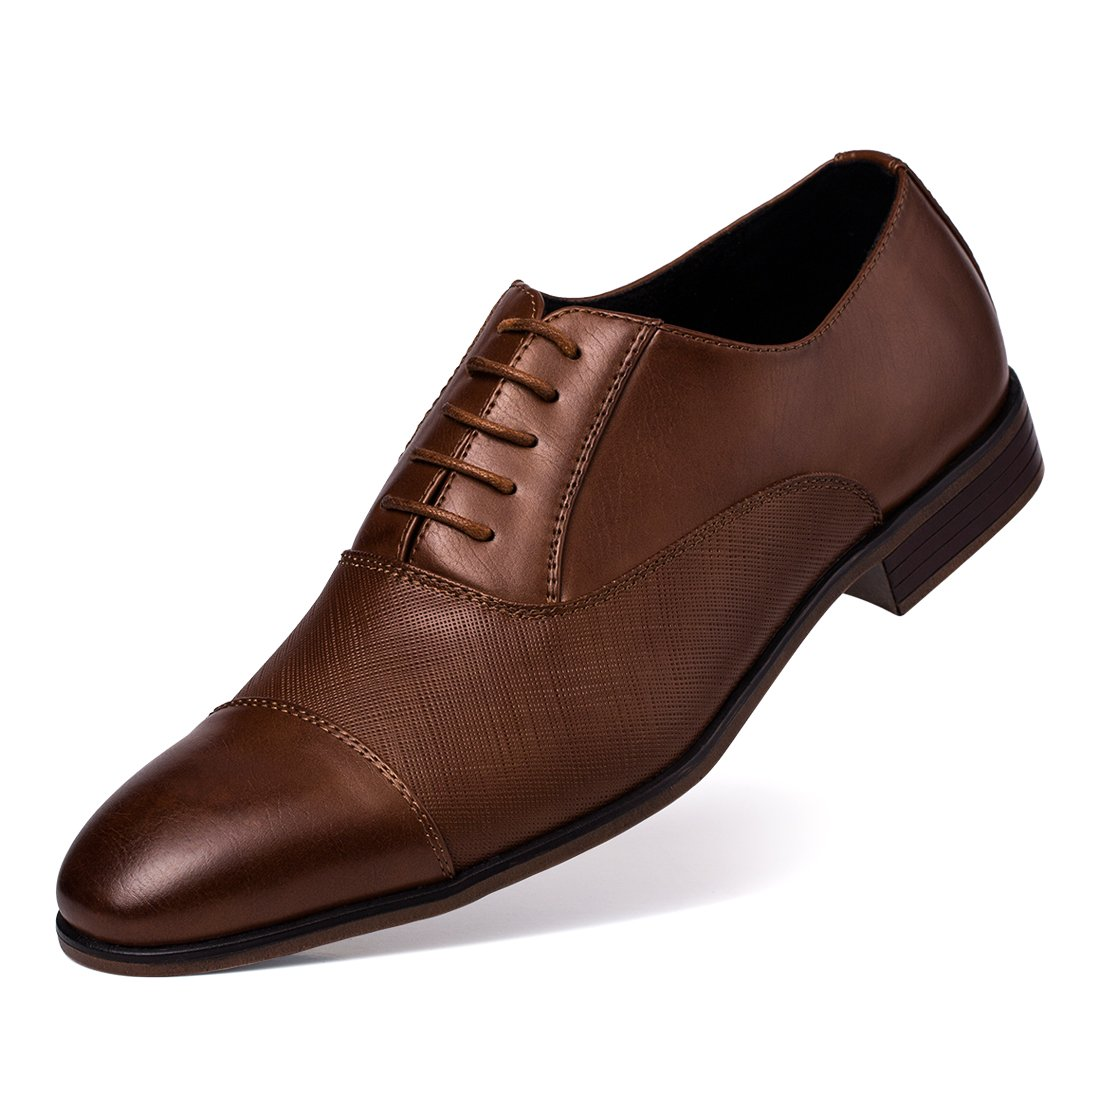 Jivana Oxford Business Dress Shoes for Men Lace-up (13, TAN-6)